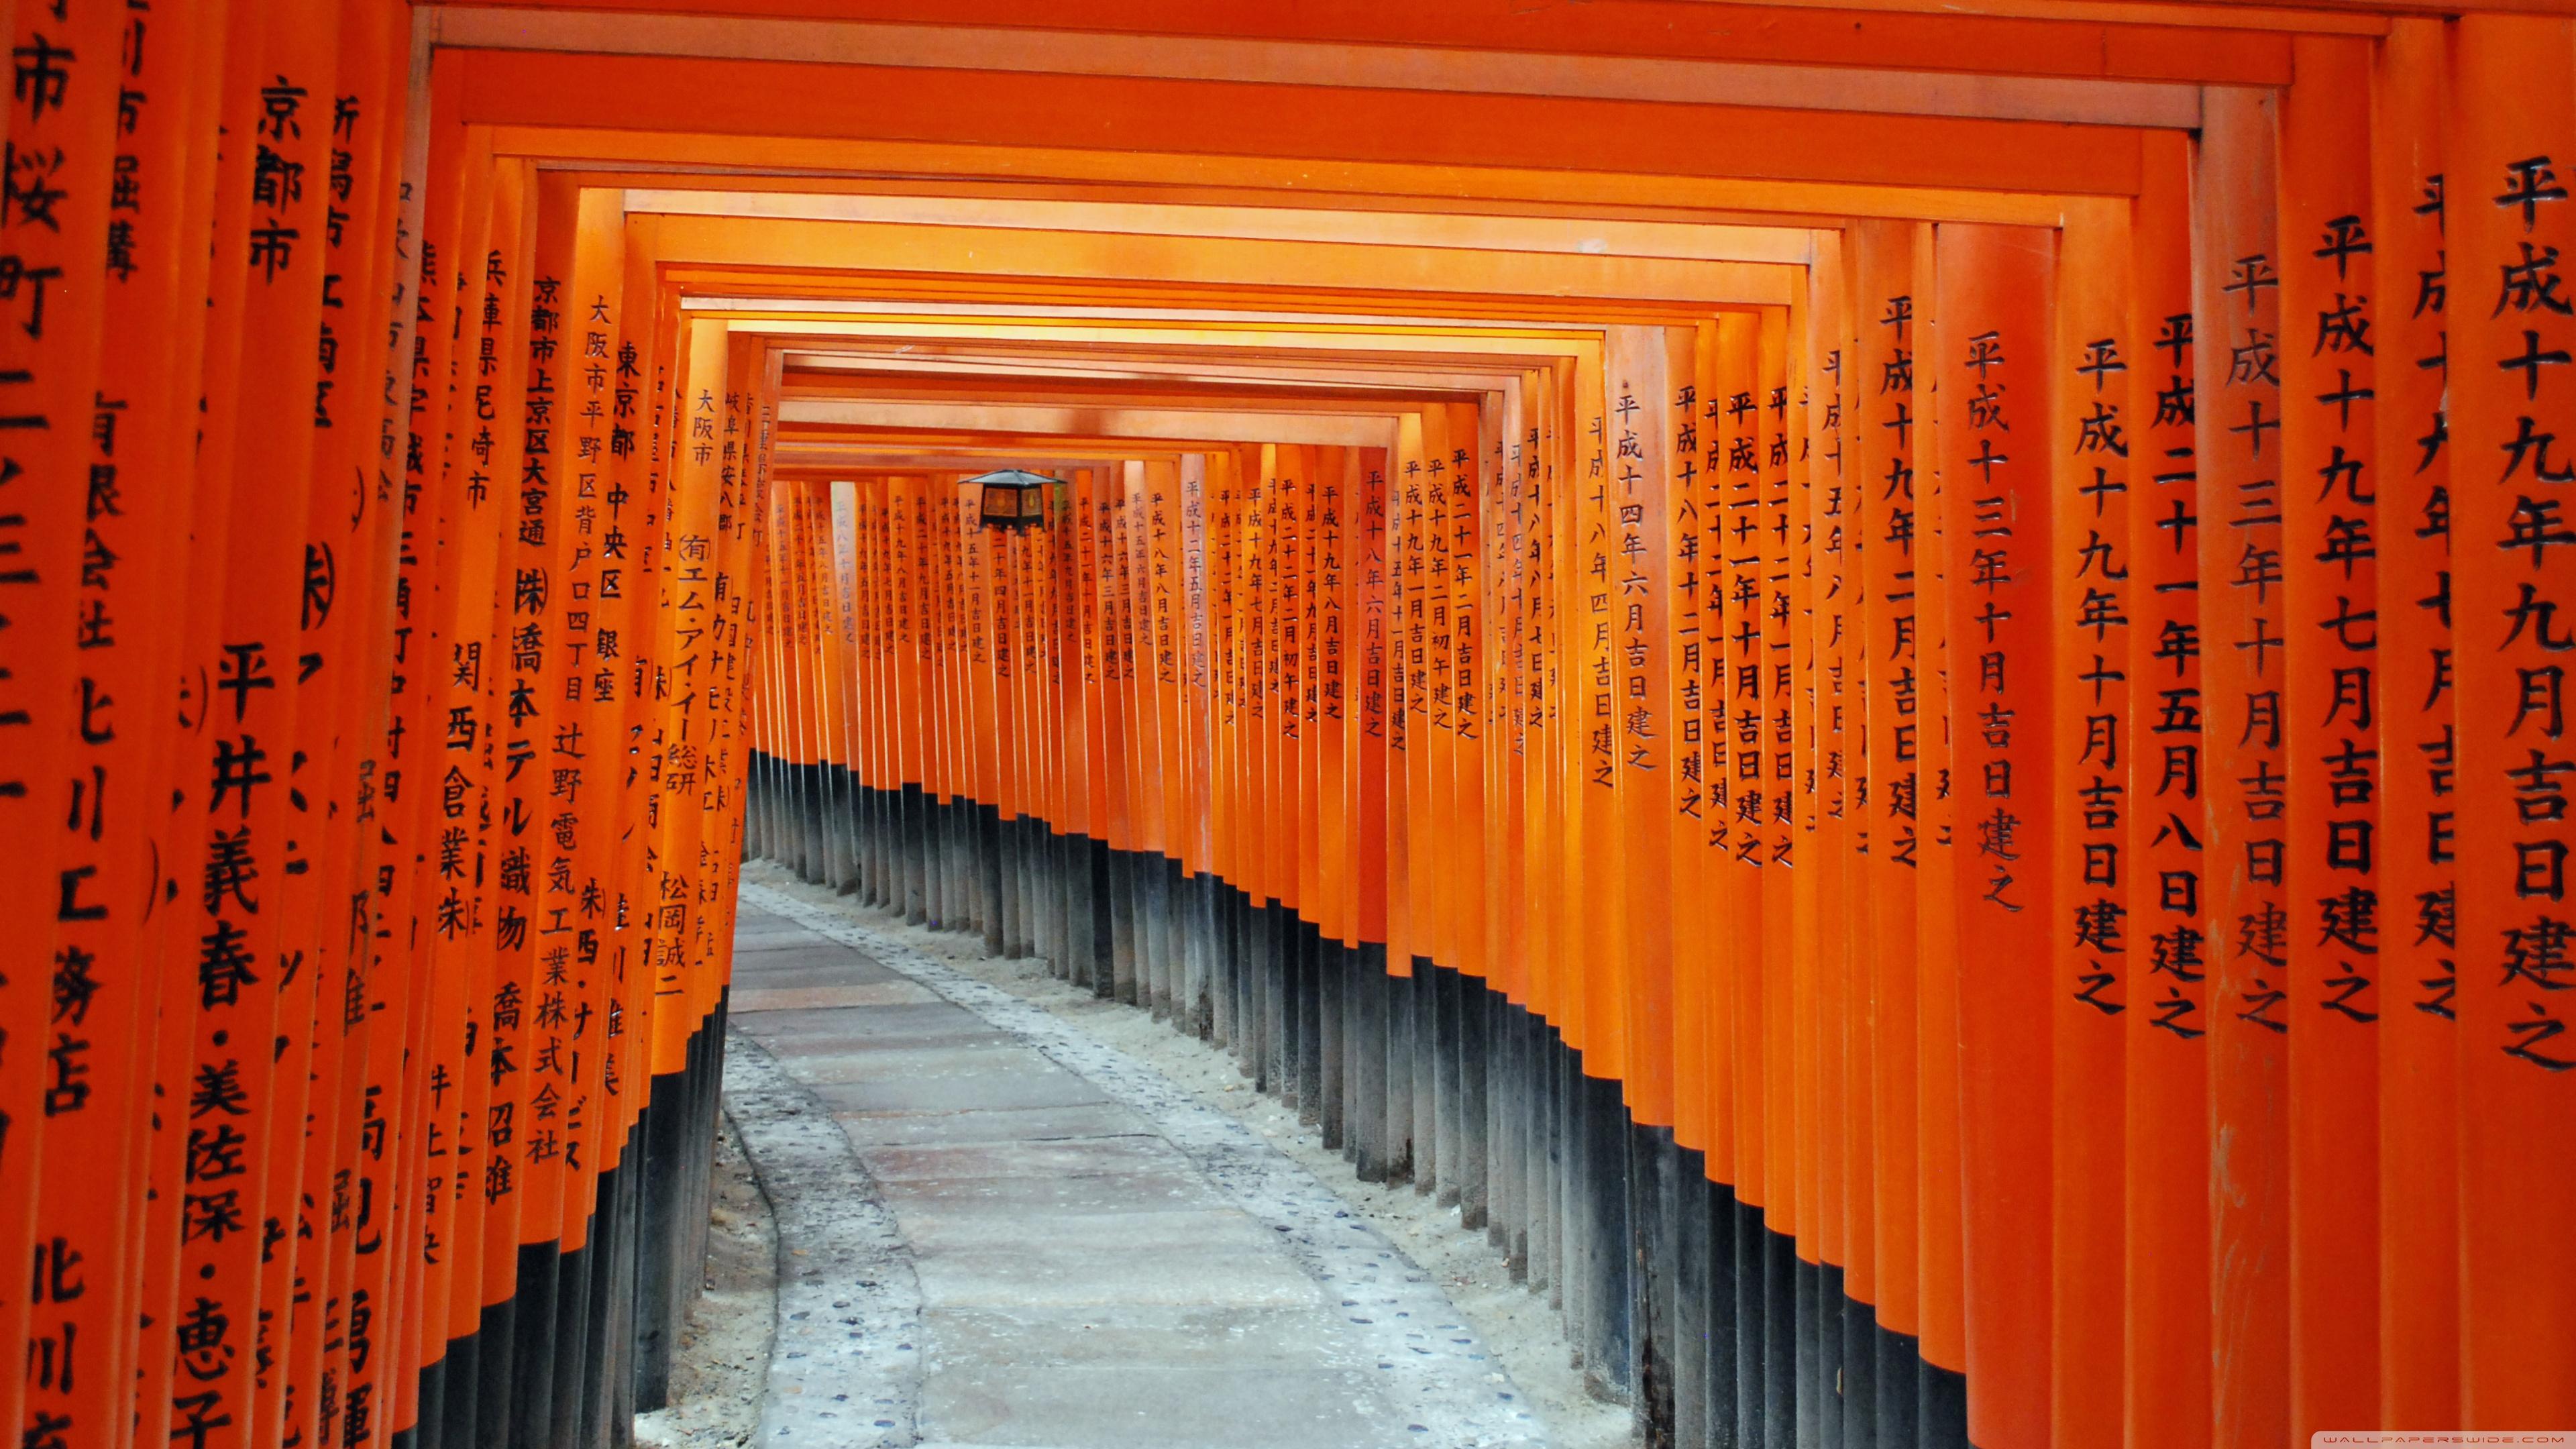 Fushimi Inari Taisha Kyoto Japan 4K HD Desktop Wallpaper for 3840x2160